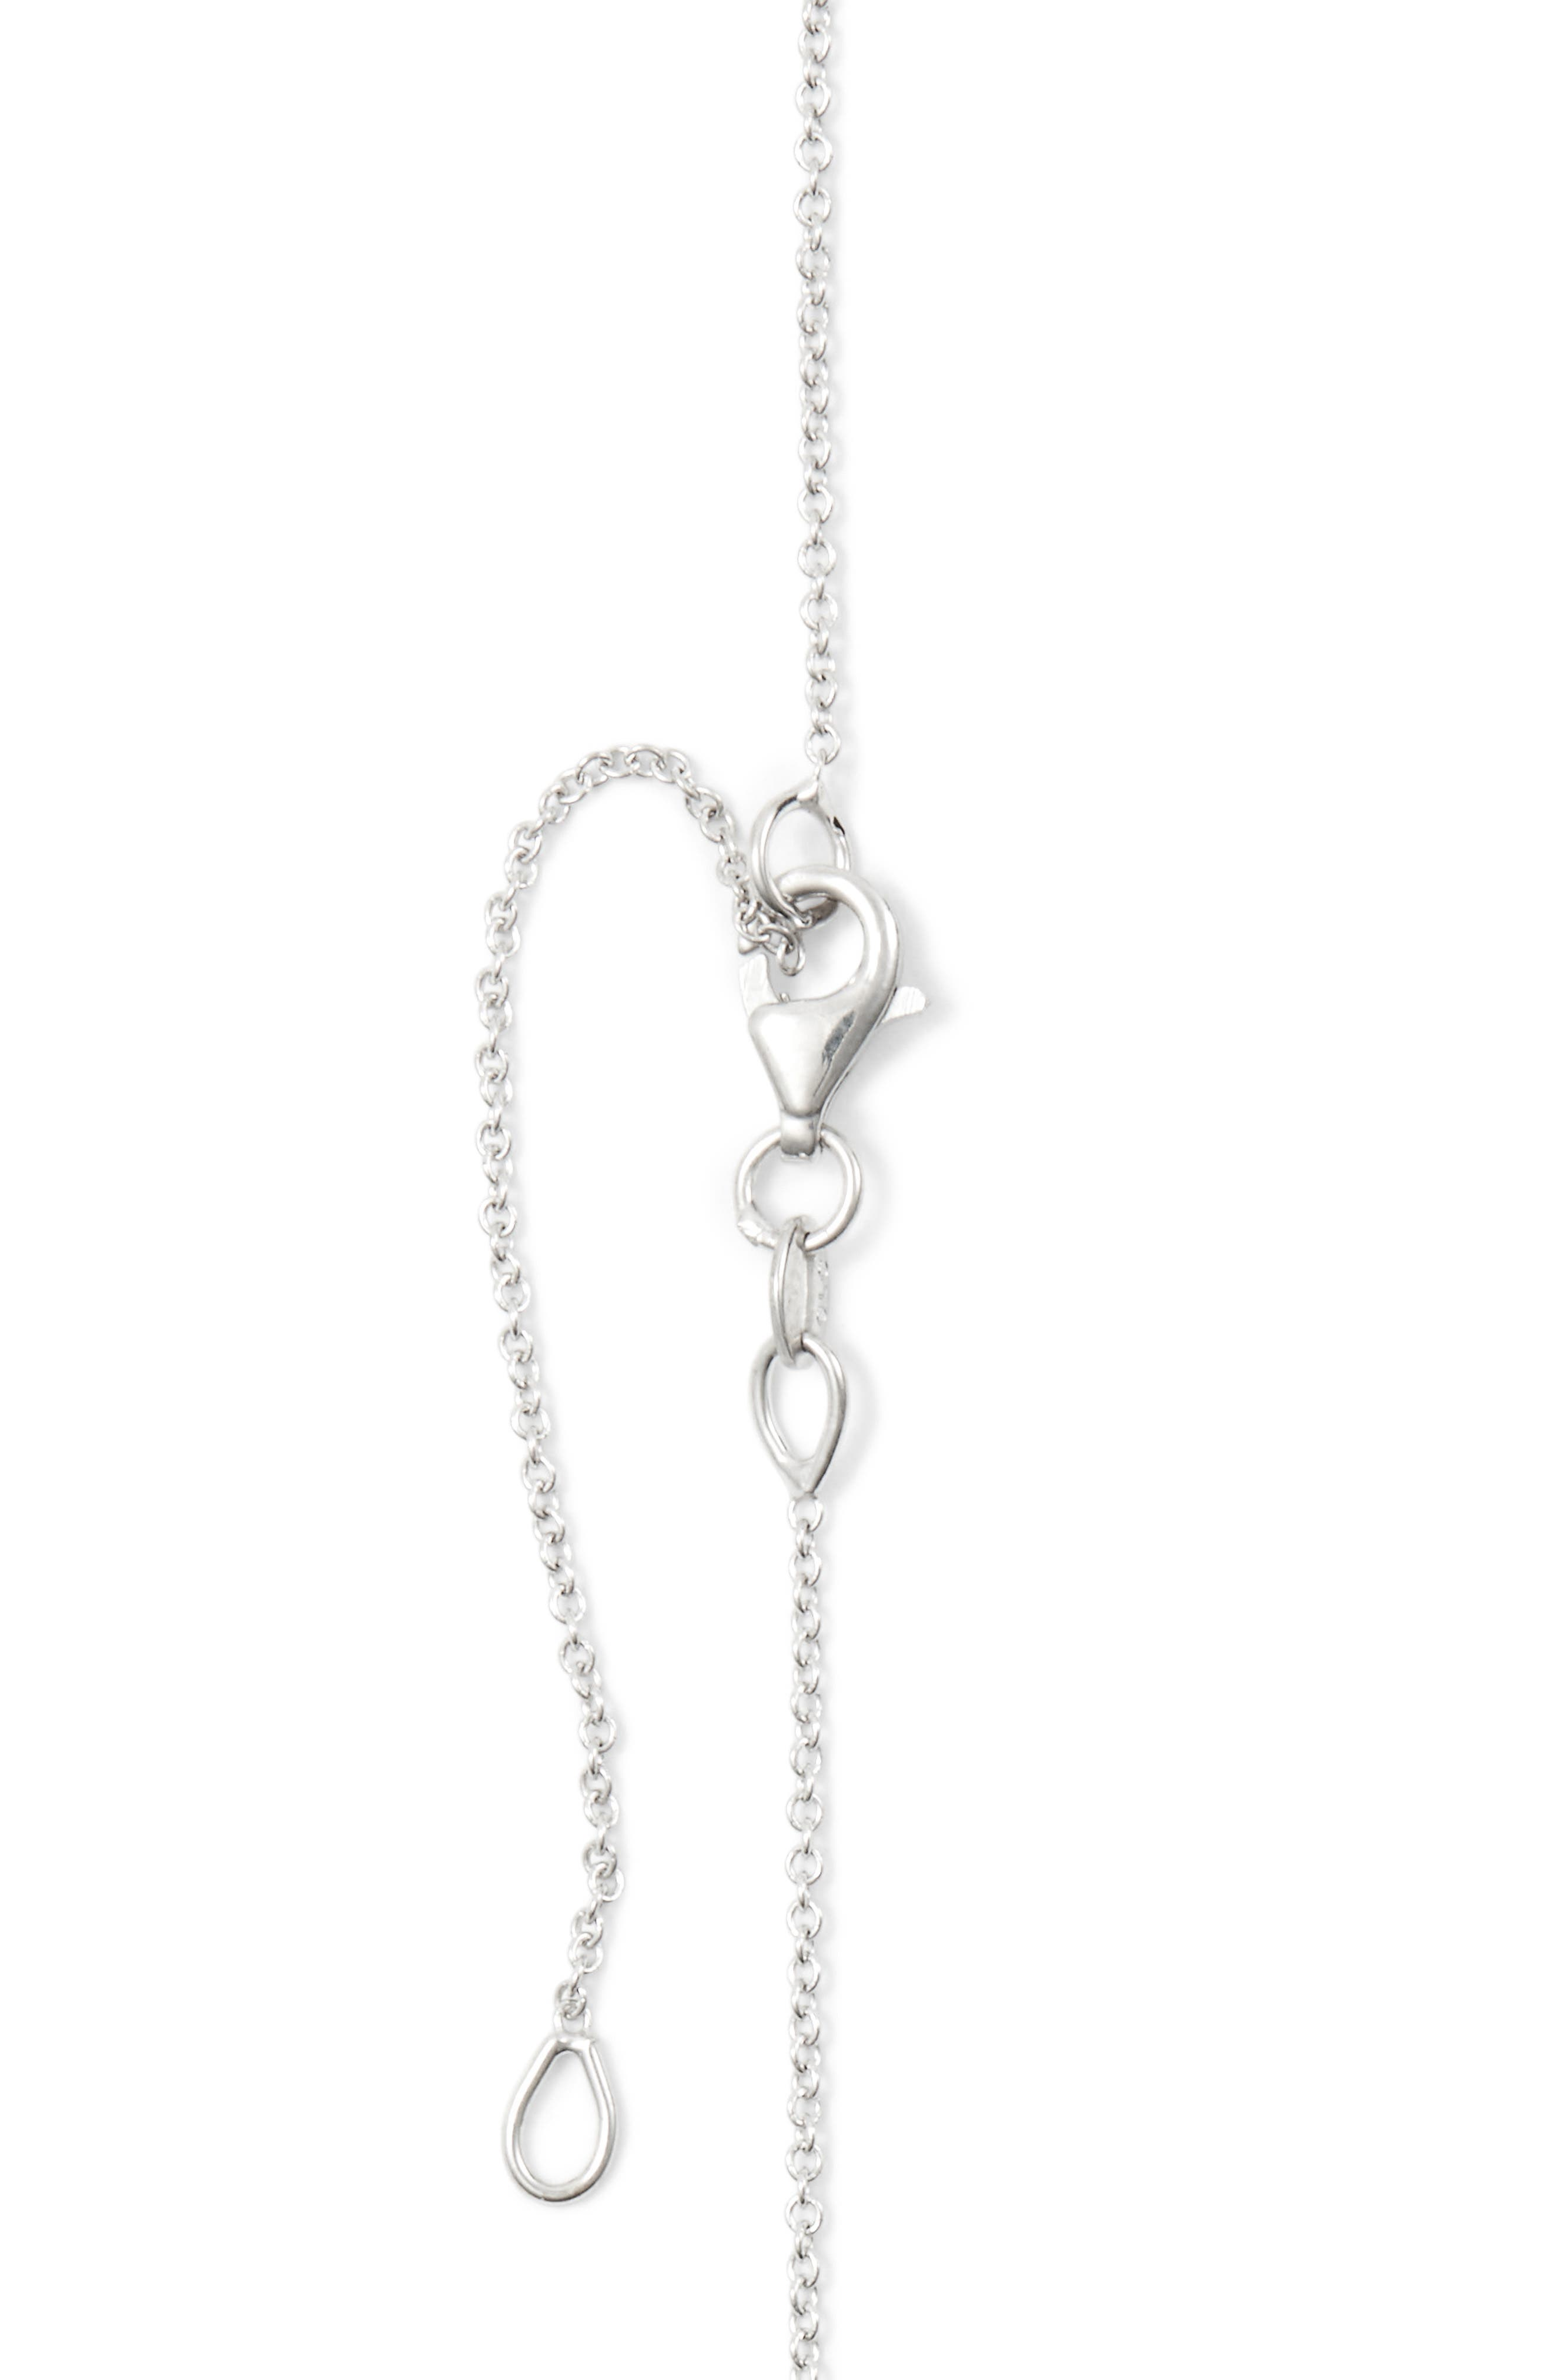 Pavé Diamond Pendant Necklace,                             Alternate thumbnail 5, color,                             White Gold